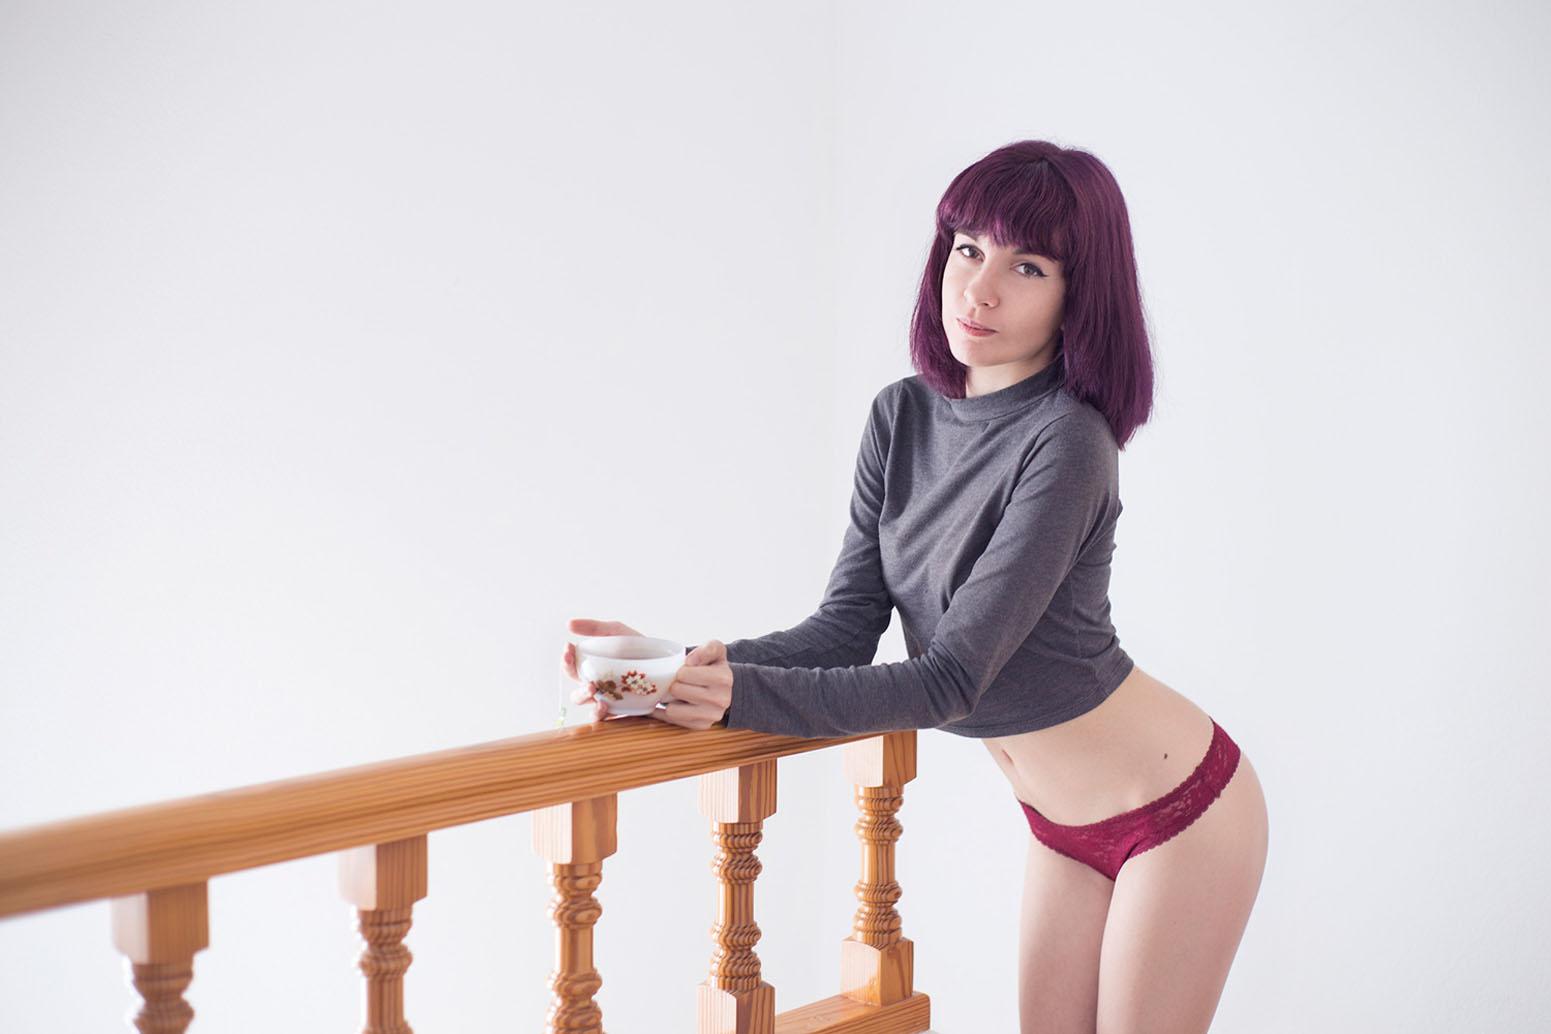 All in this tea - Moninoke by Lorena Blaze